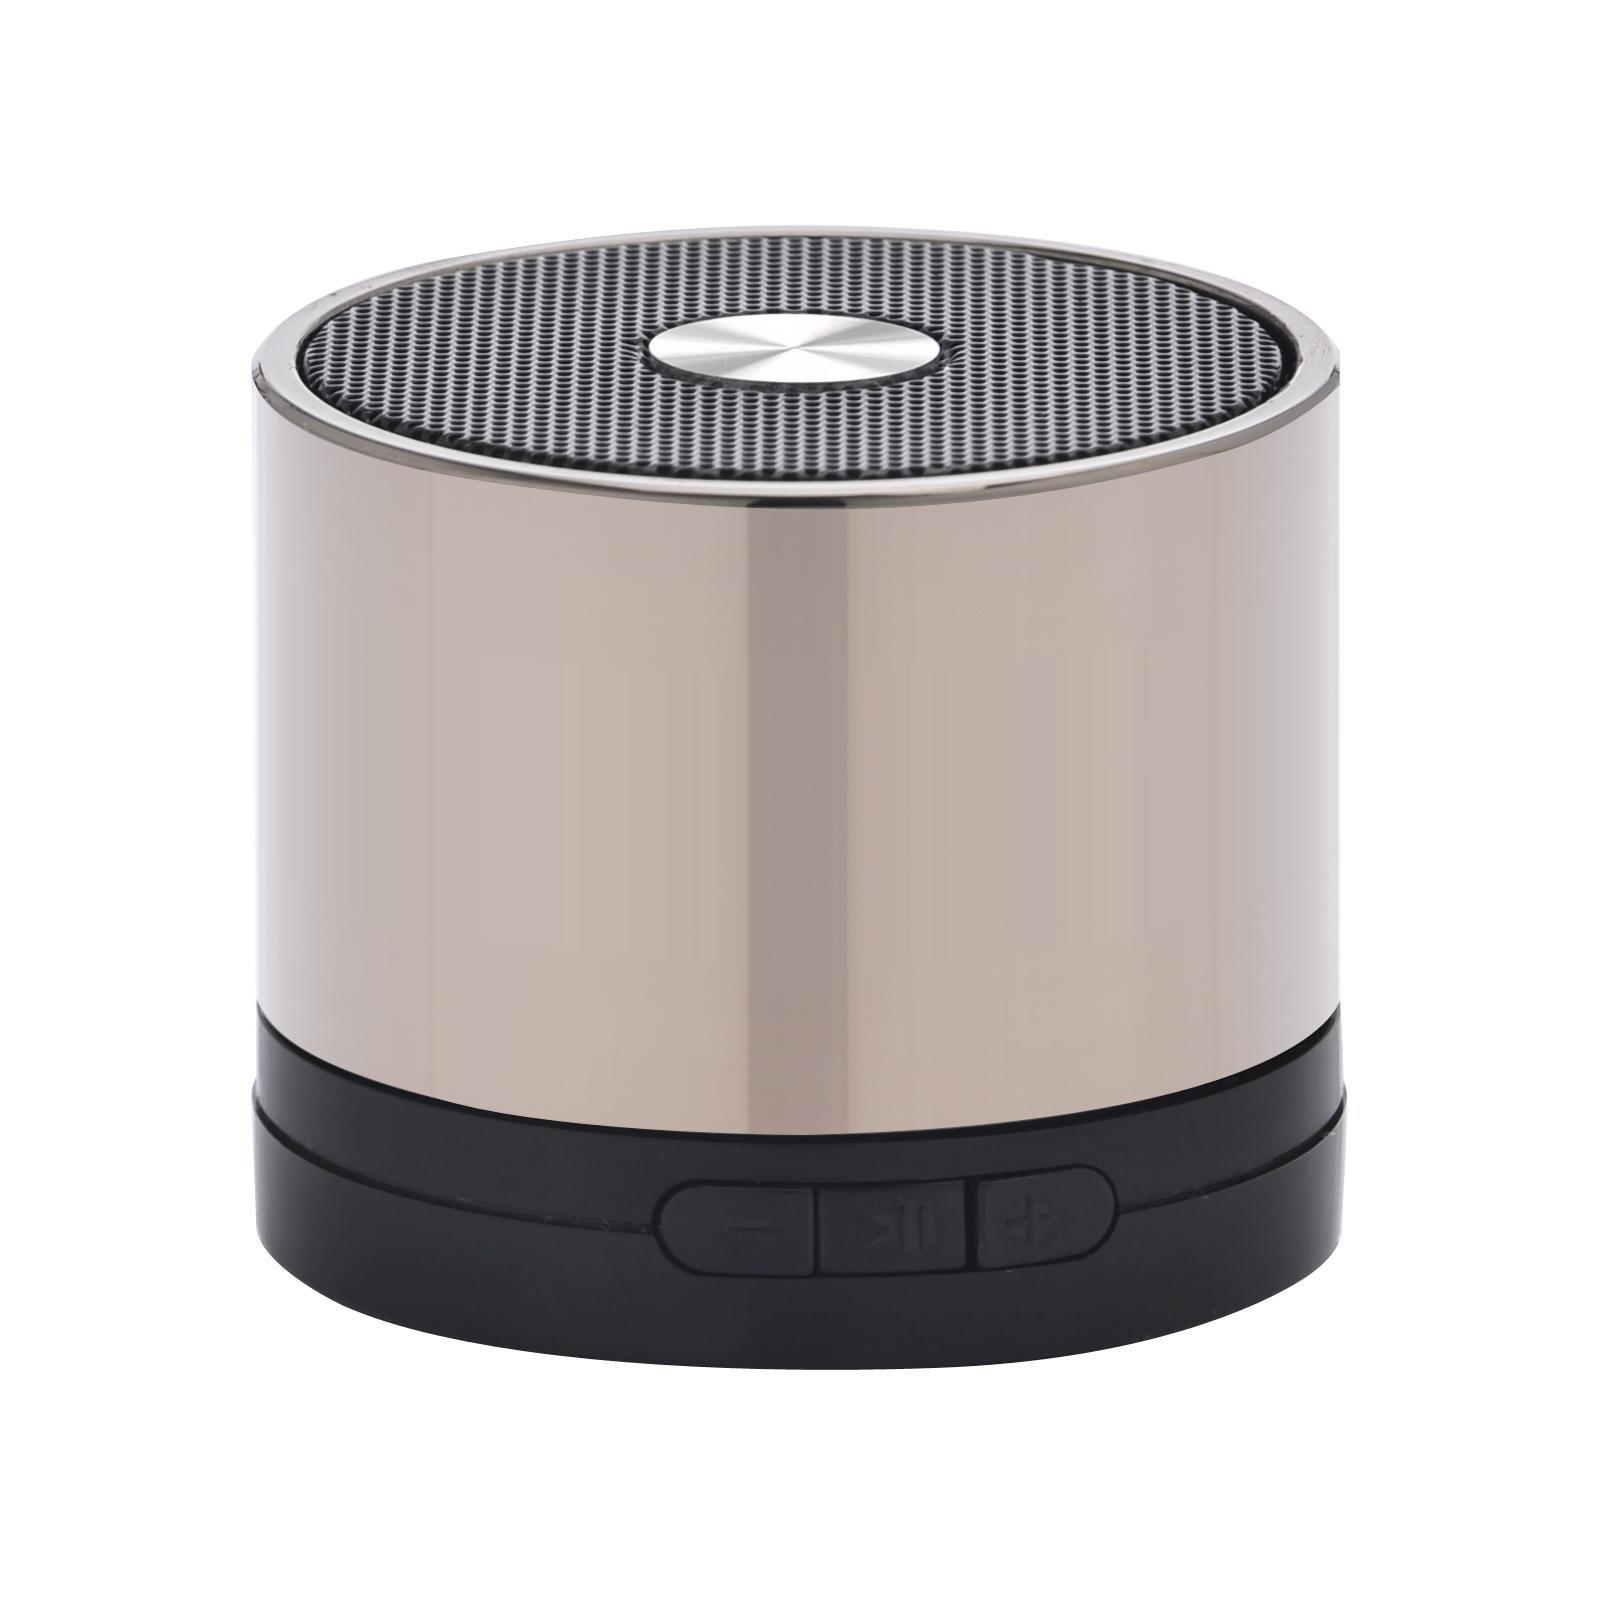 Bluetooth Mini Portable Wireless Speaker Mp3 Player